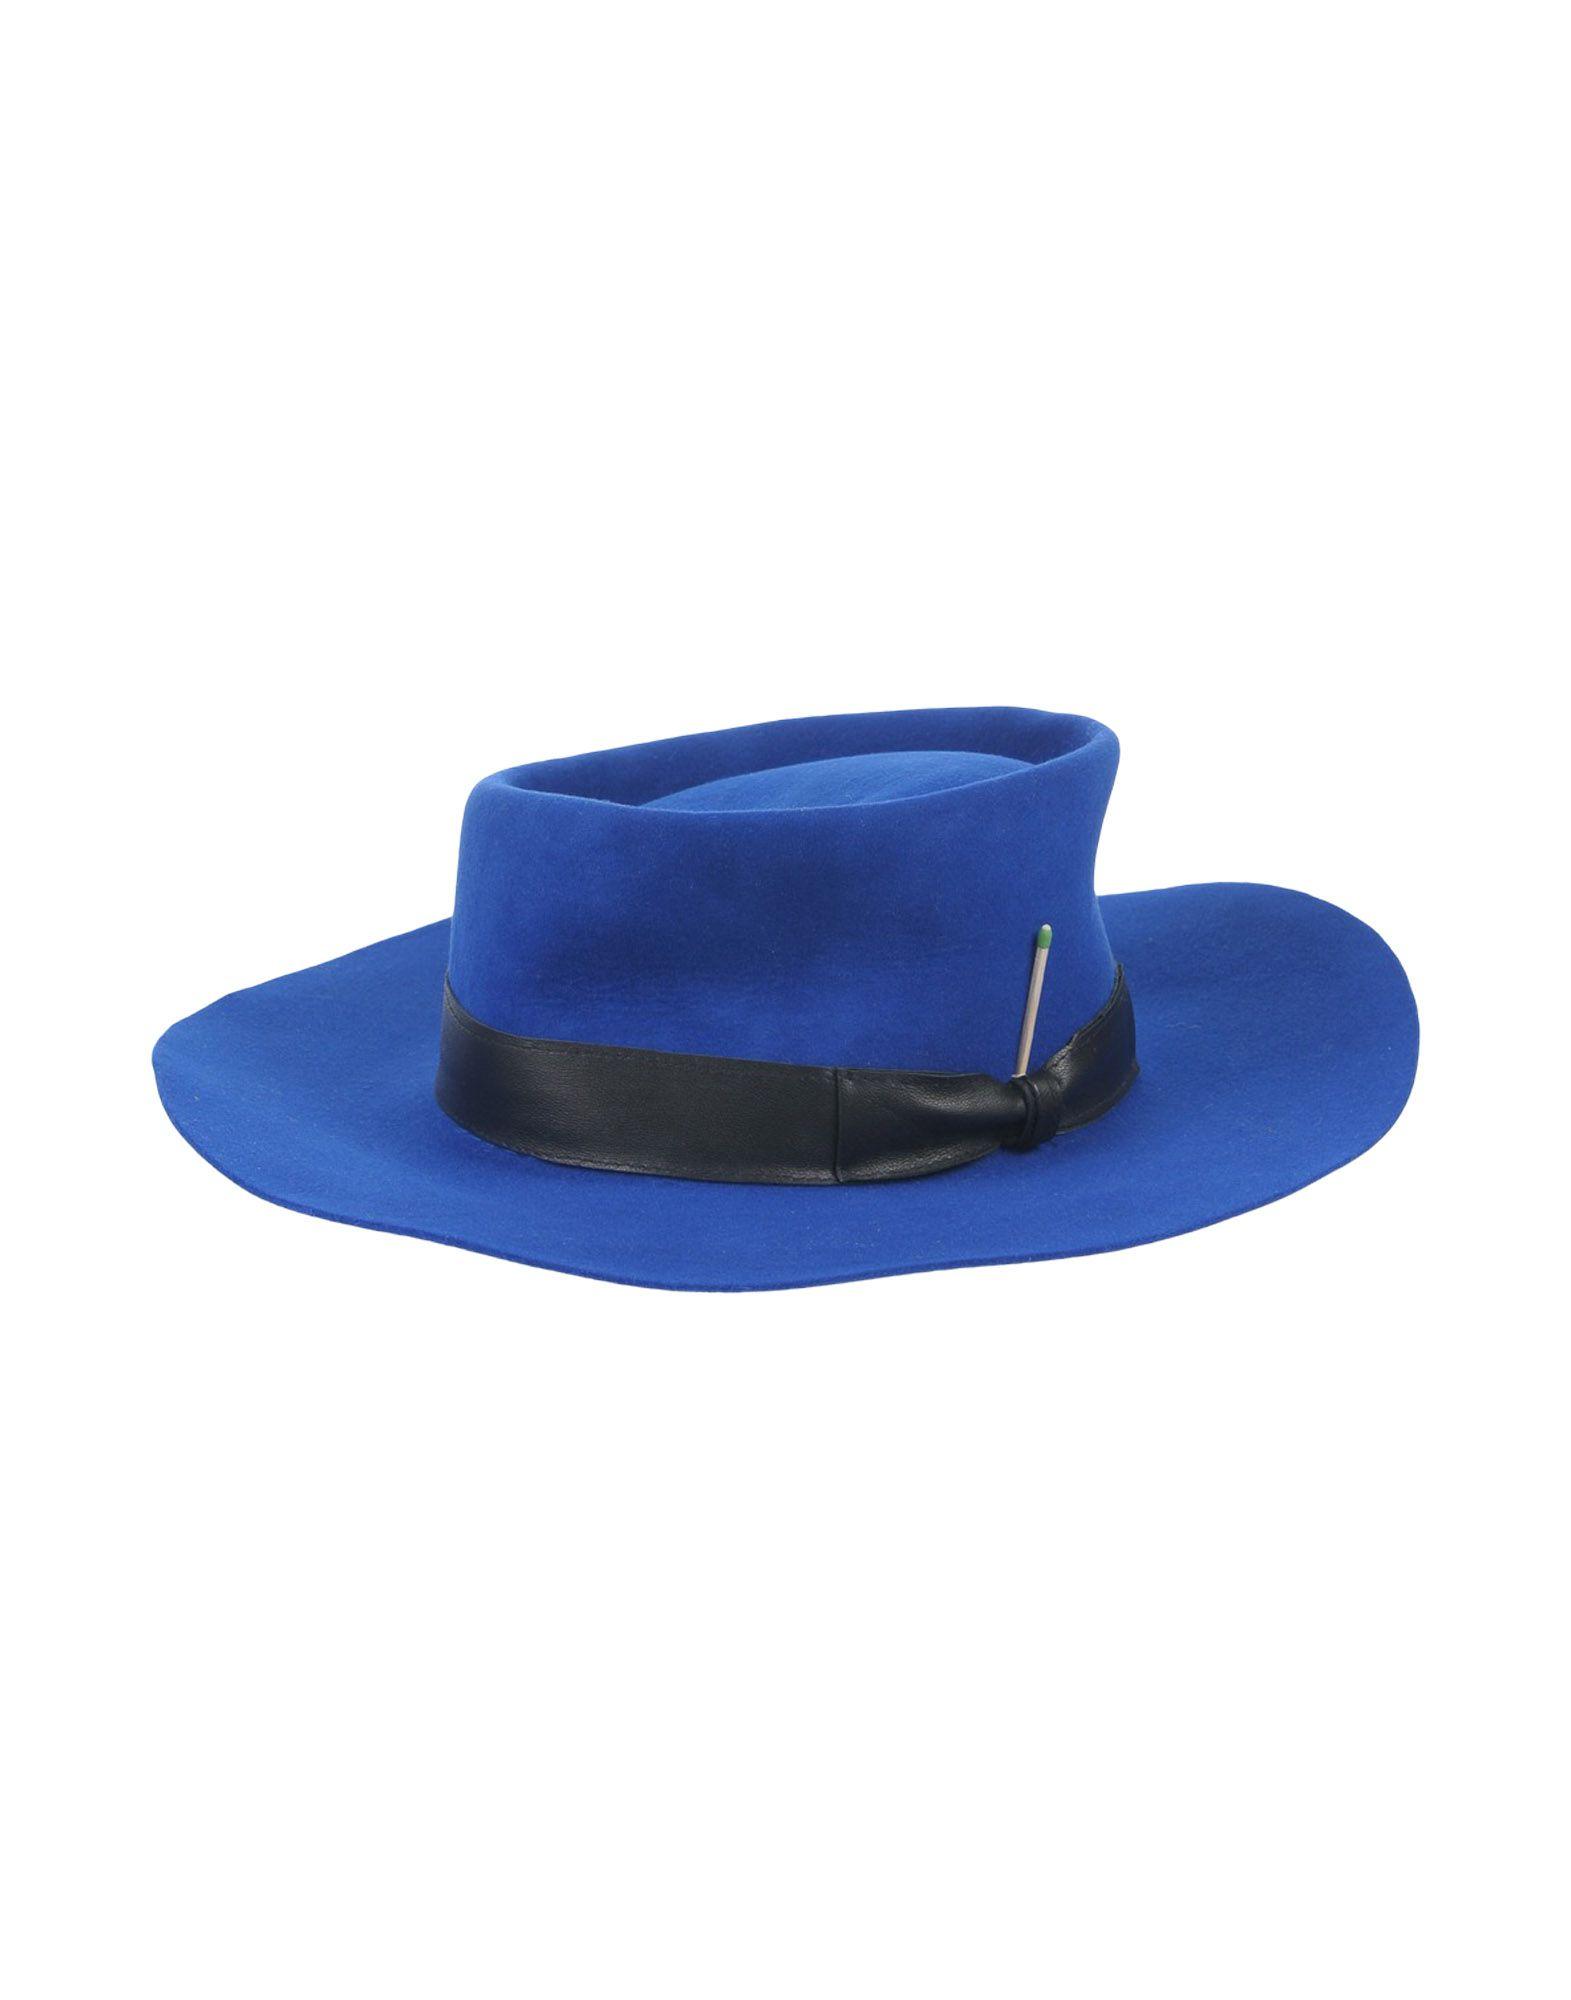 Cappello Nick Fouguet Uomo - Acquista online su